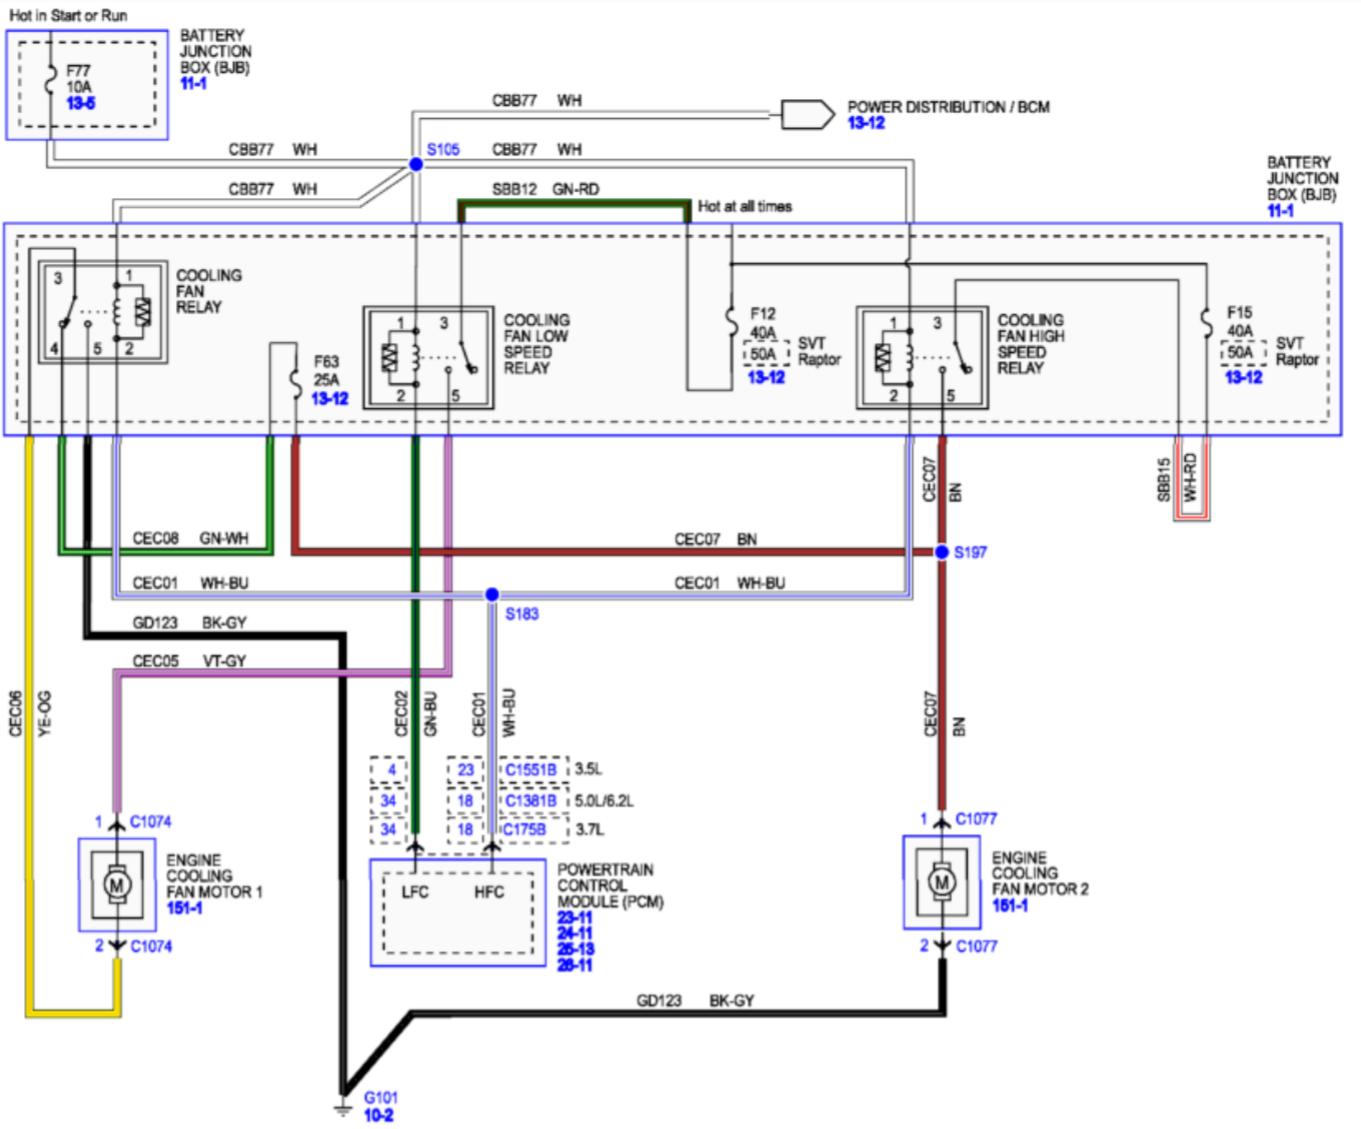 Ford F150 Fan Wiring Diagram - Data Wiring Pair die-summer -  die-summer.newmorpheus.it | Ford F150 Fan Wiring Diagram |  | newmorpheus.it